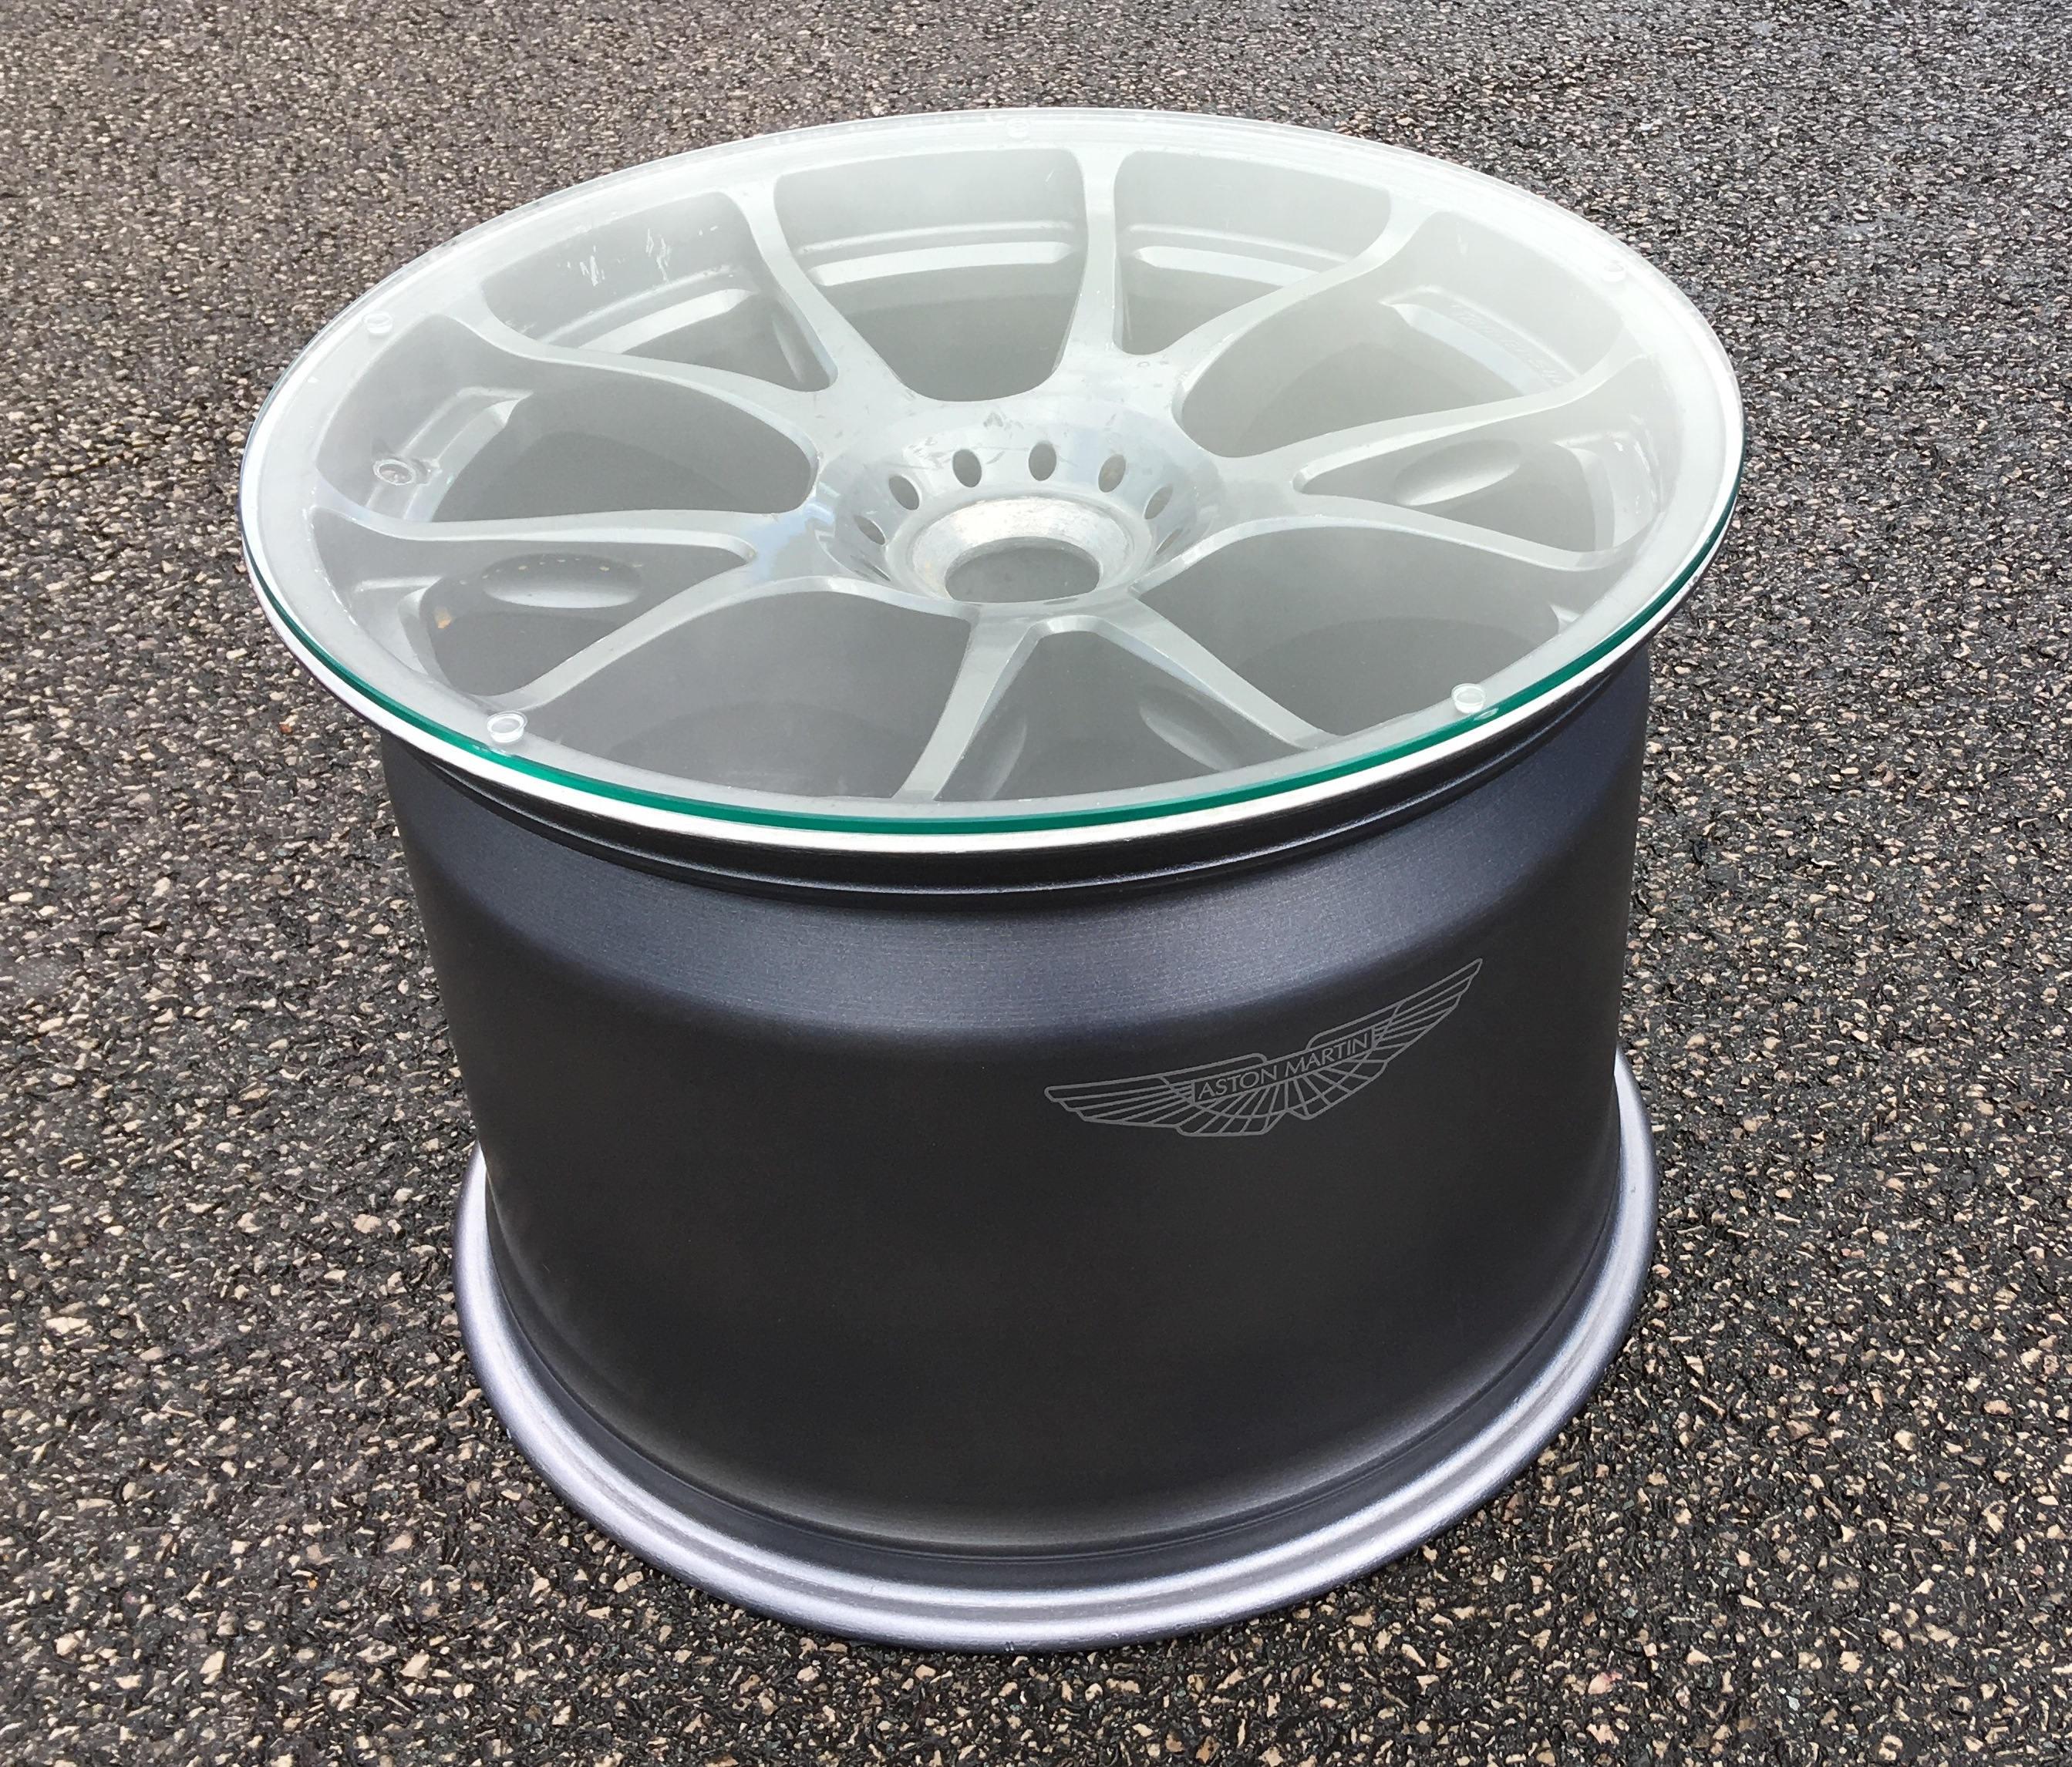 V8 Engine Glass Table: Aston Martin Le-mans GTE Racecar Wheel Rim Coffee Side